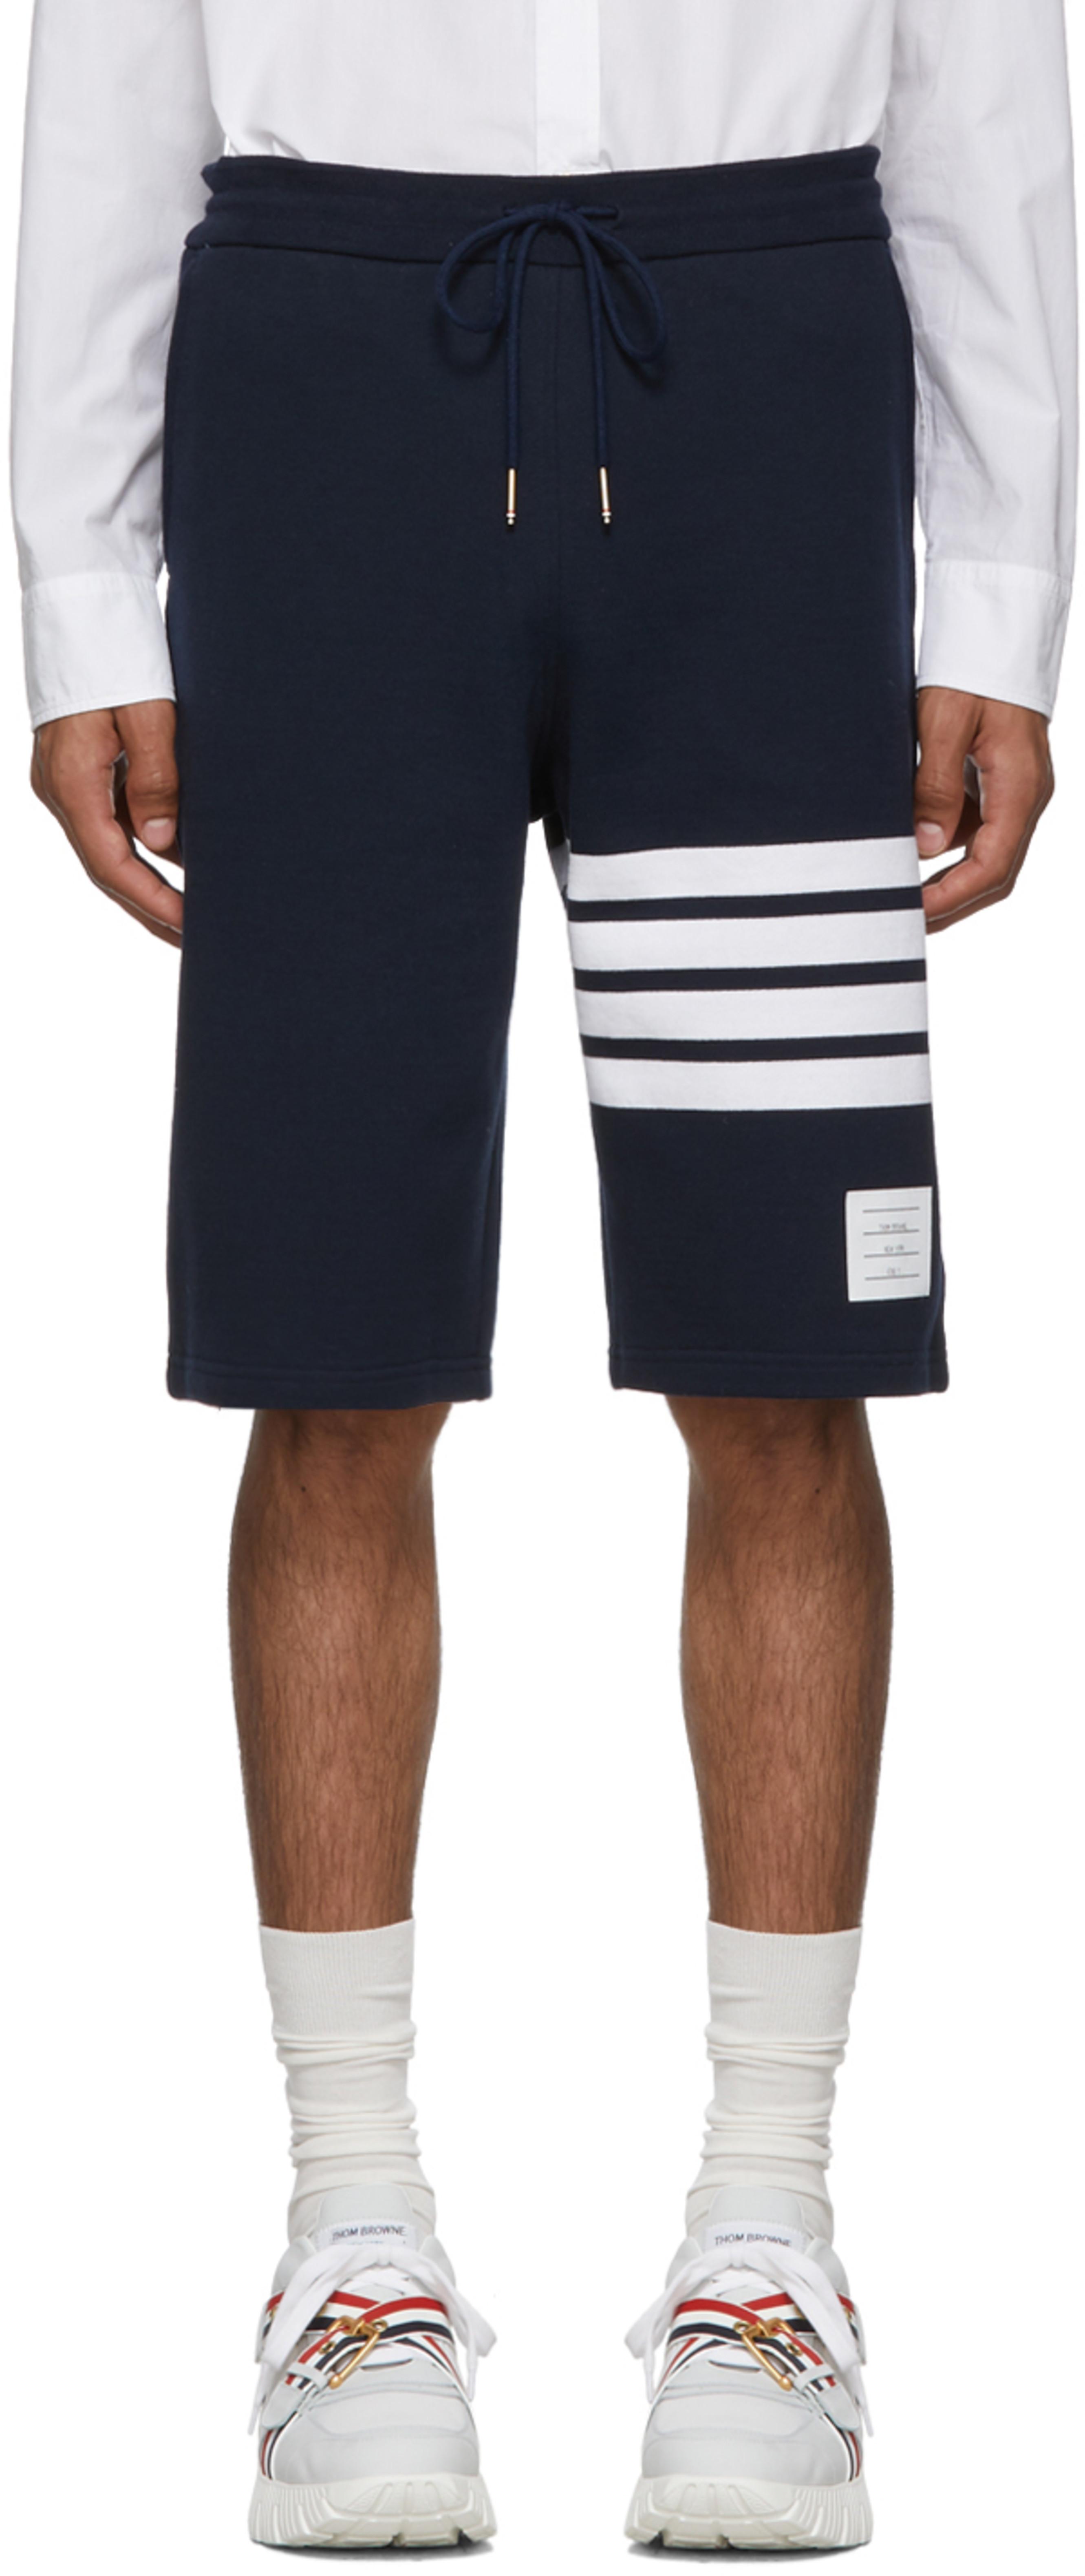 De 4 Survêtement Classic Short Bleu Marine Bar rCodxBe